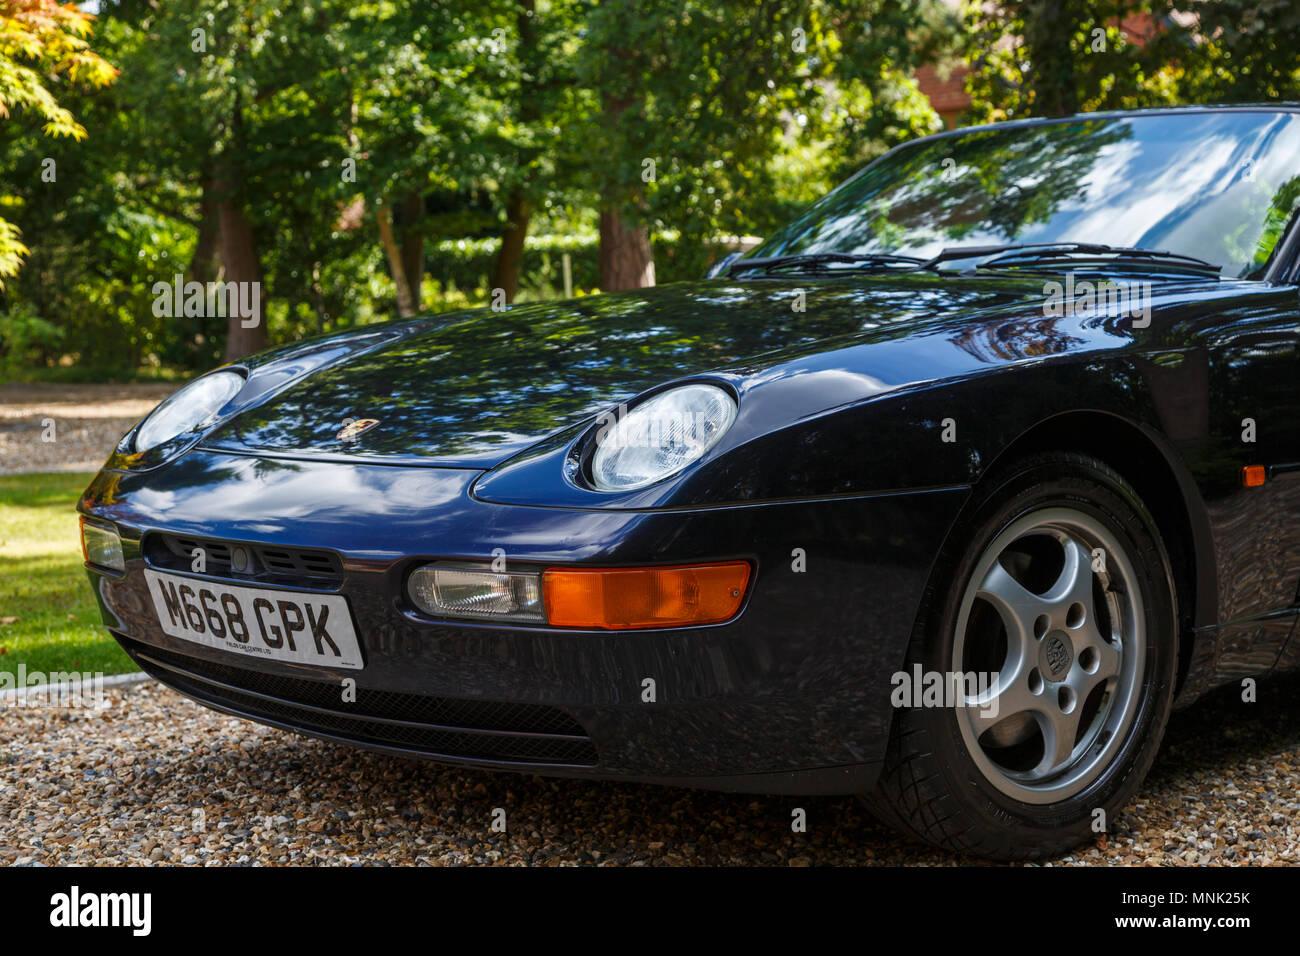 Front Bonnet Of A Classic Vintage Porsche Sports Car A Metallic Midnight Blue Porsche 968 Stock Photo Alamy